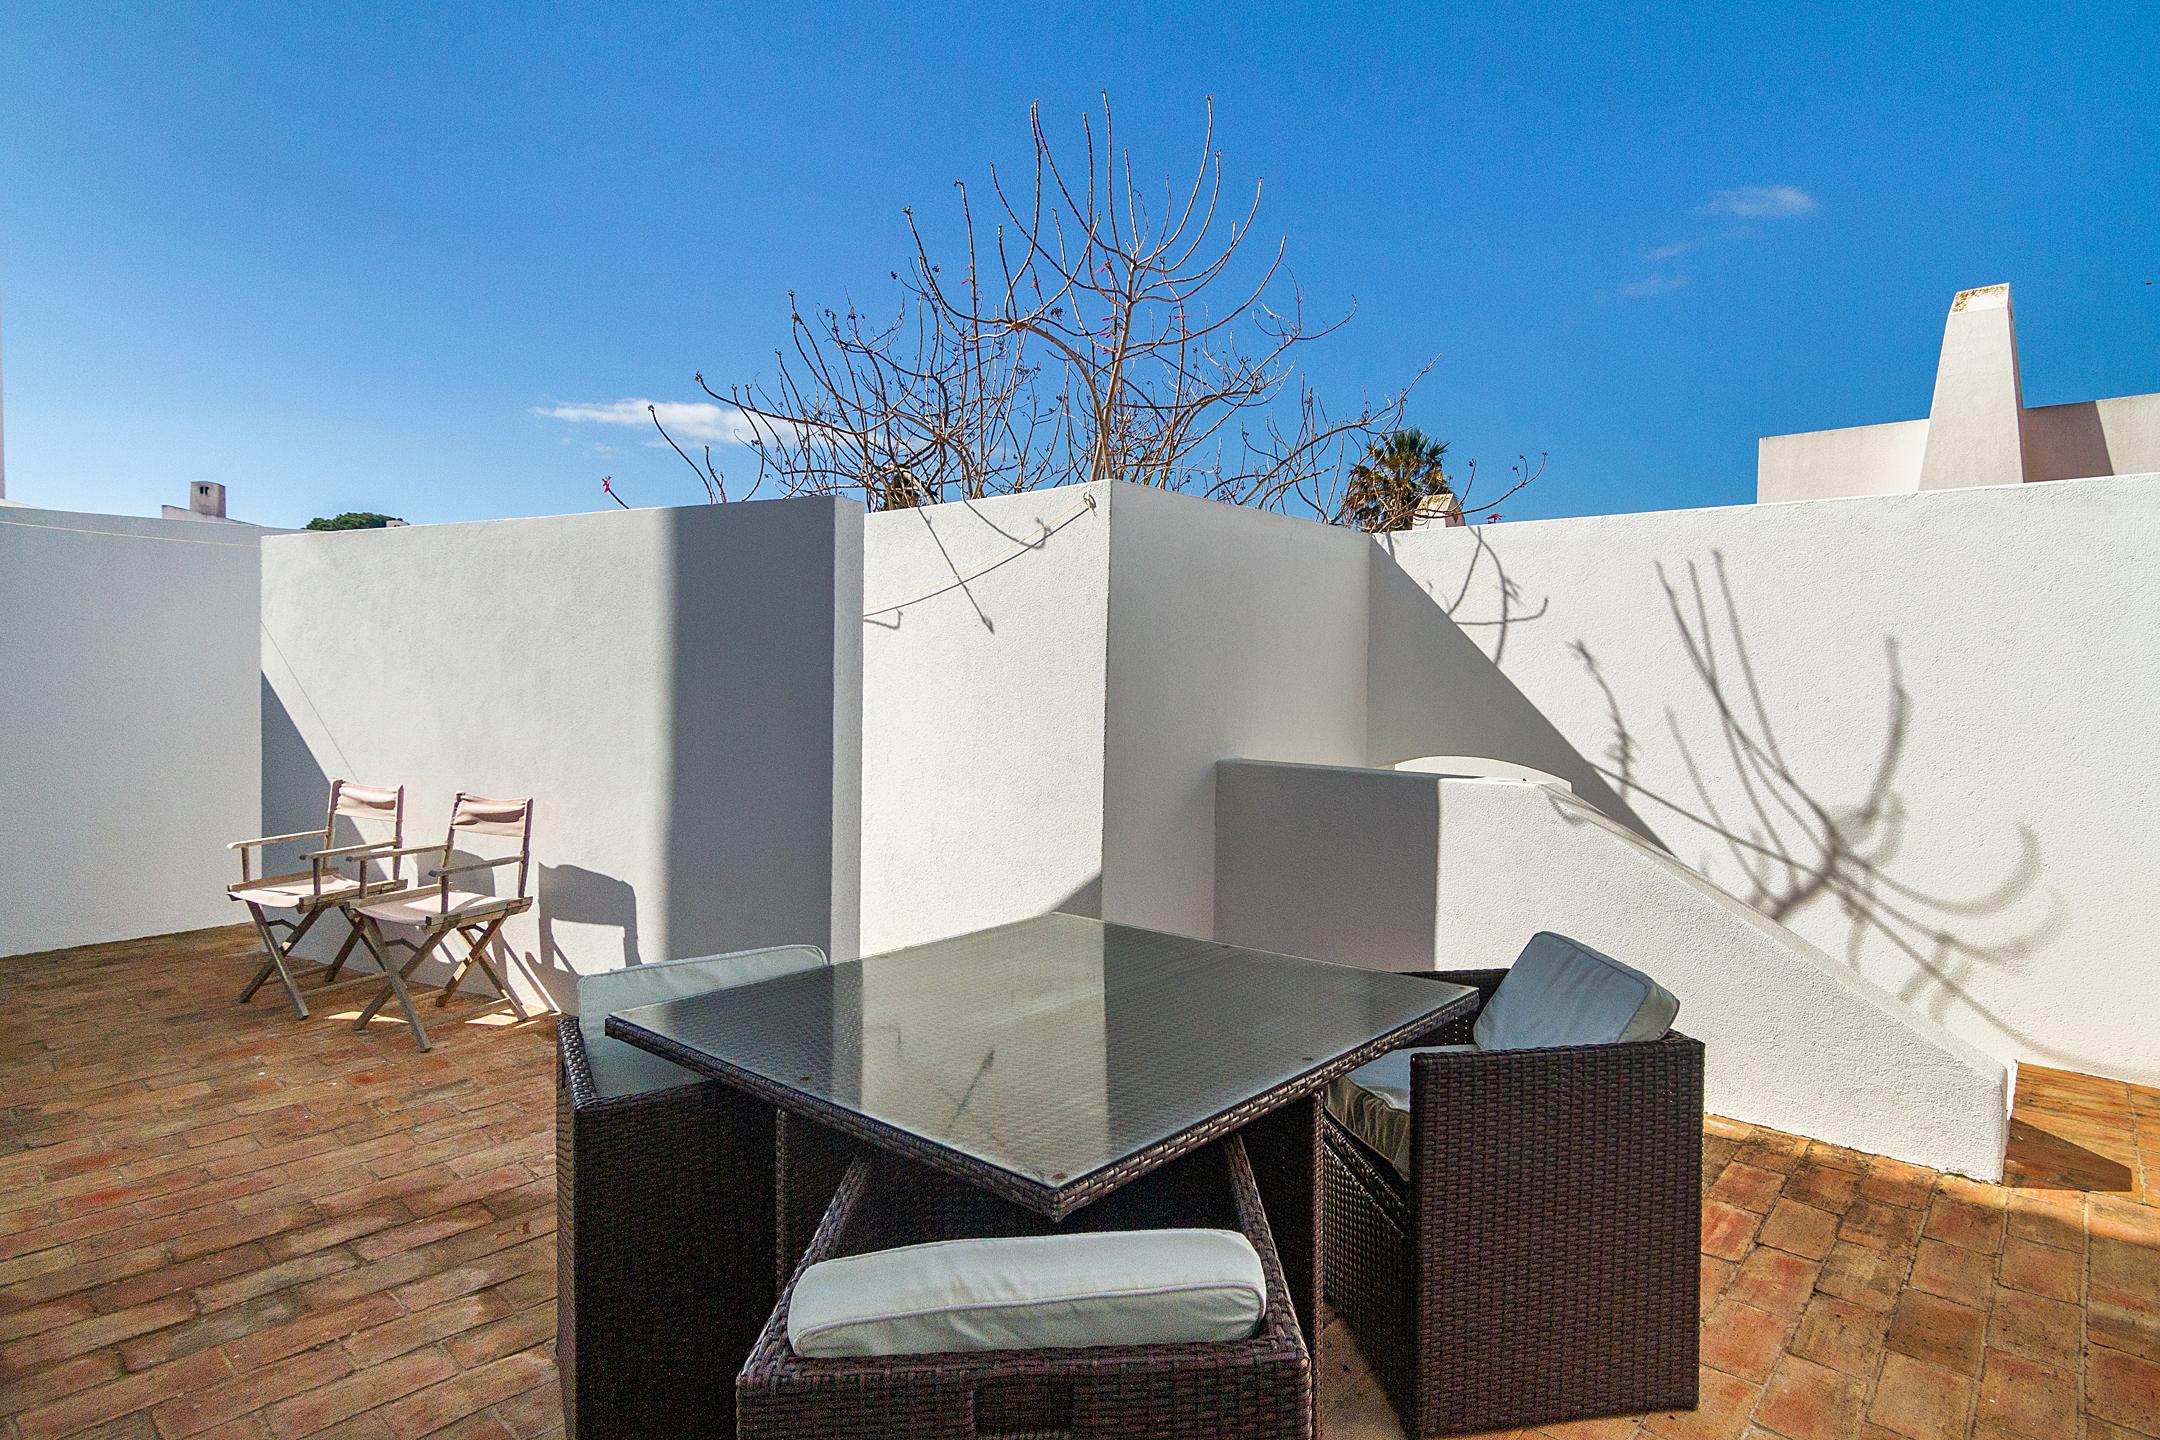 Location appartements et villas de vacance, Liiiving in Algarve | Alvor Blue Villa à Alvor, Portugal Algarve, REF_IMG_14545_14550